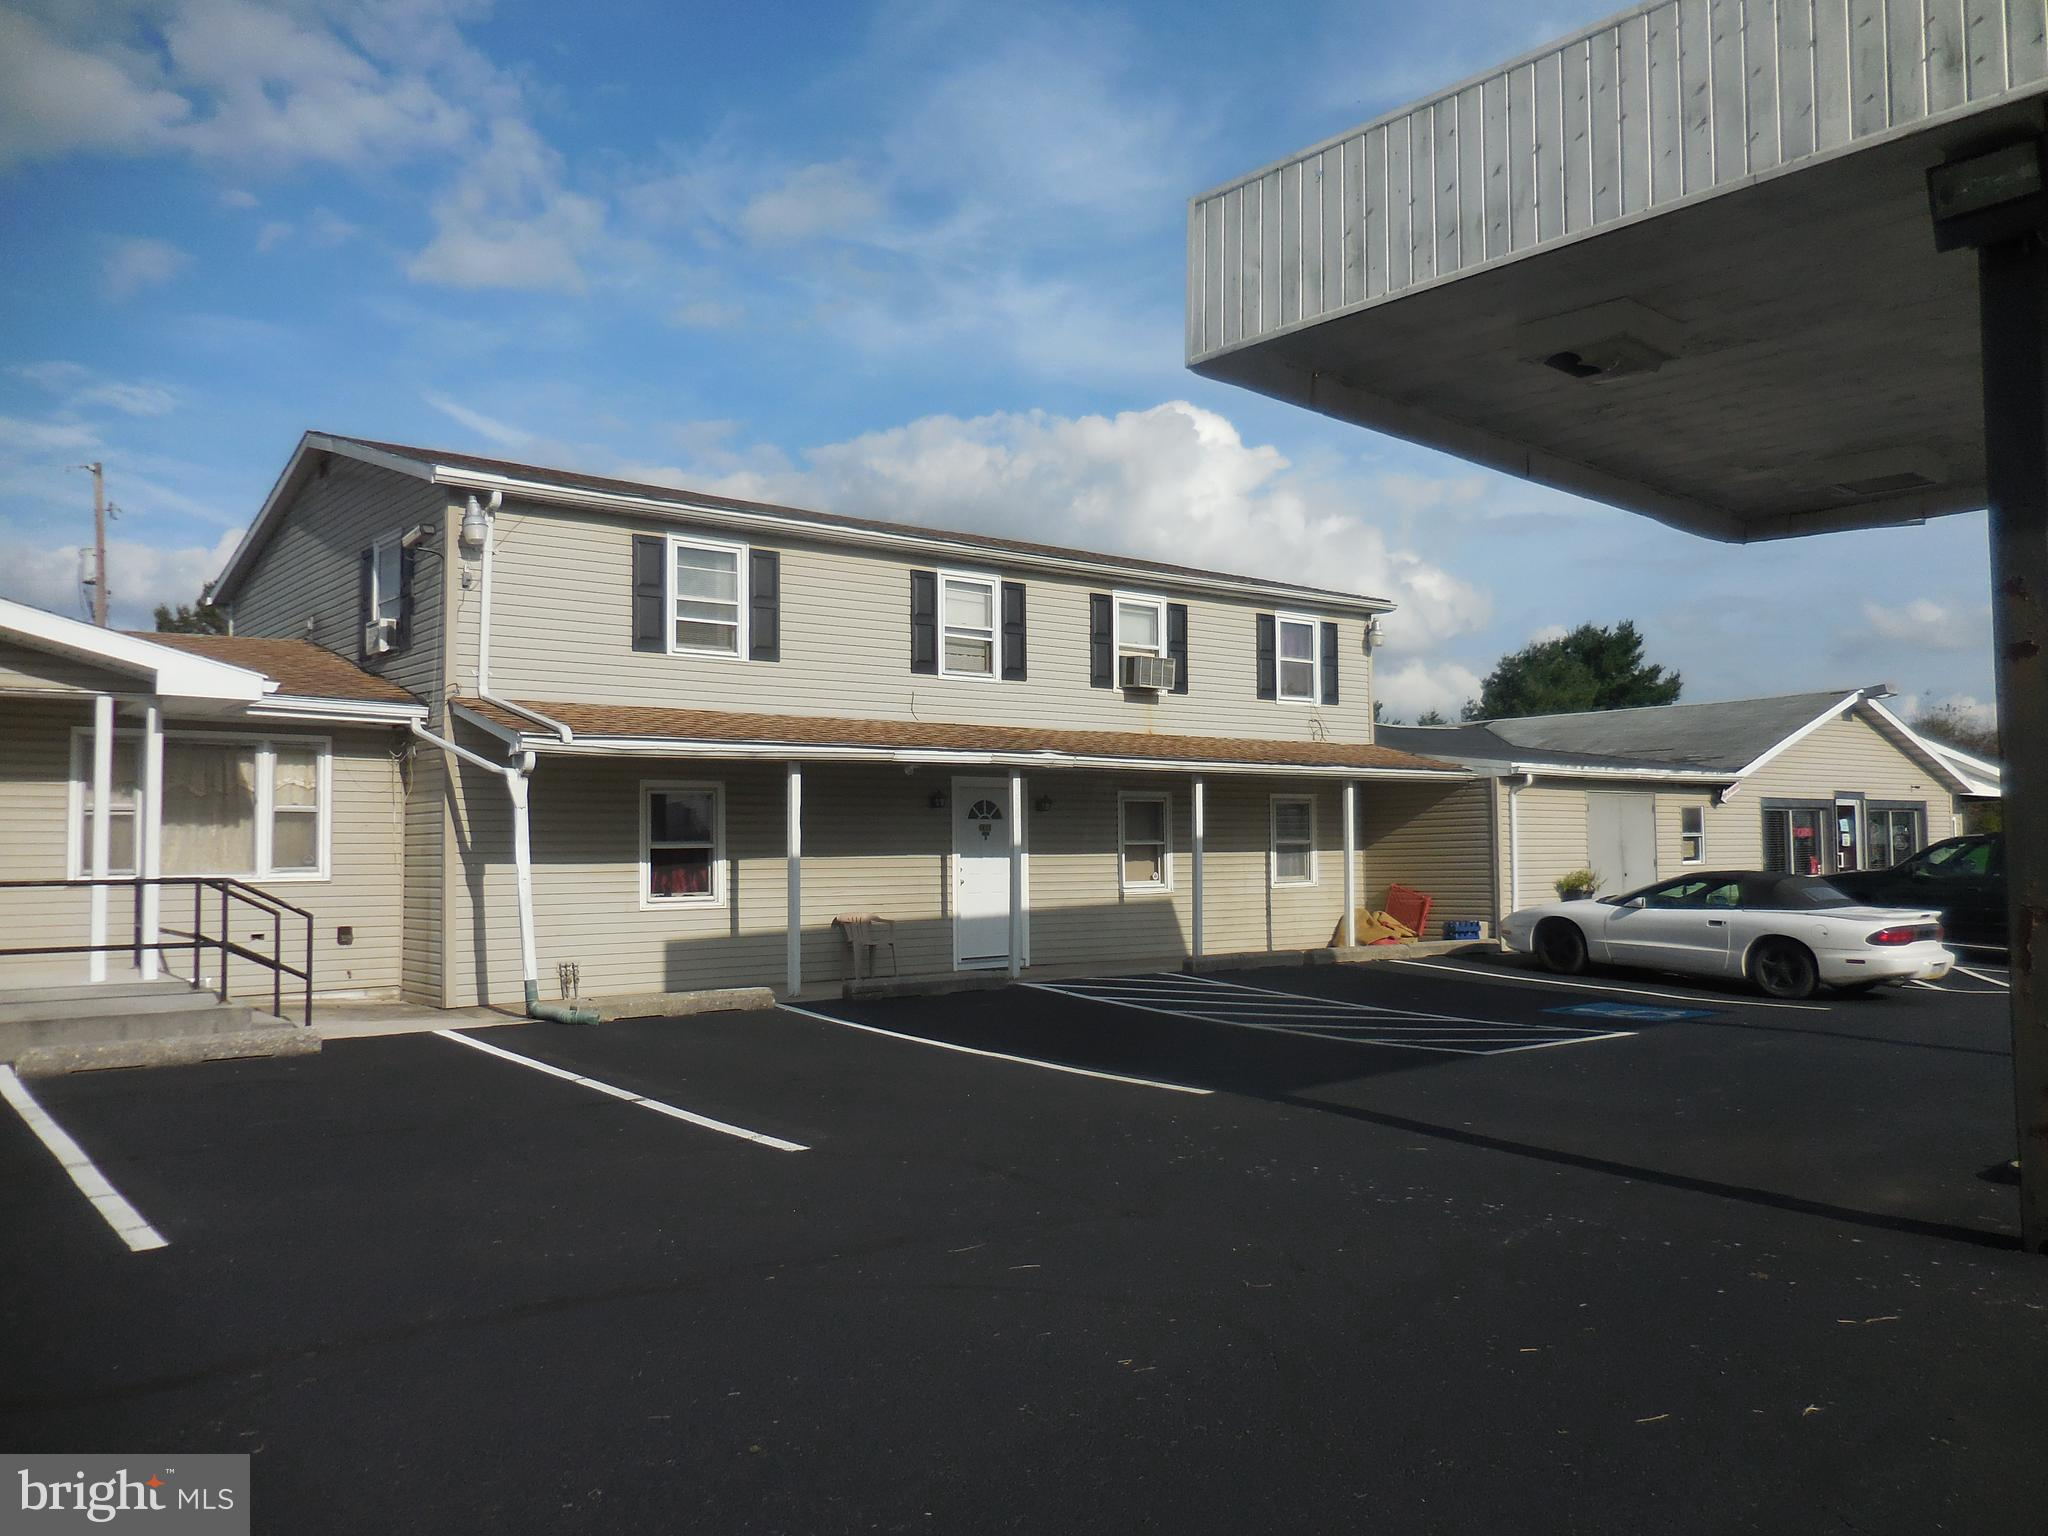 3585 Chambersburg Rd, Biglerville, PA, 17307